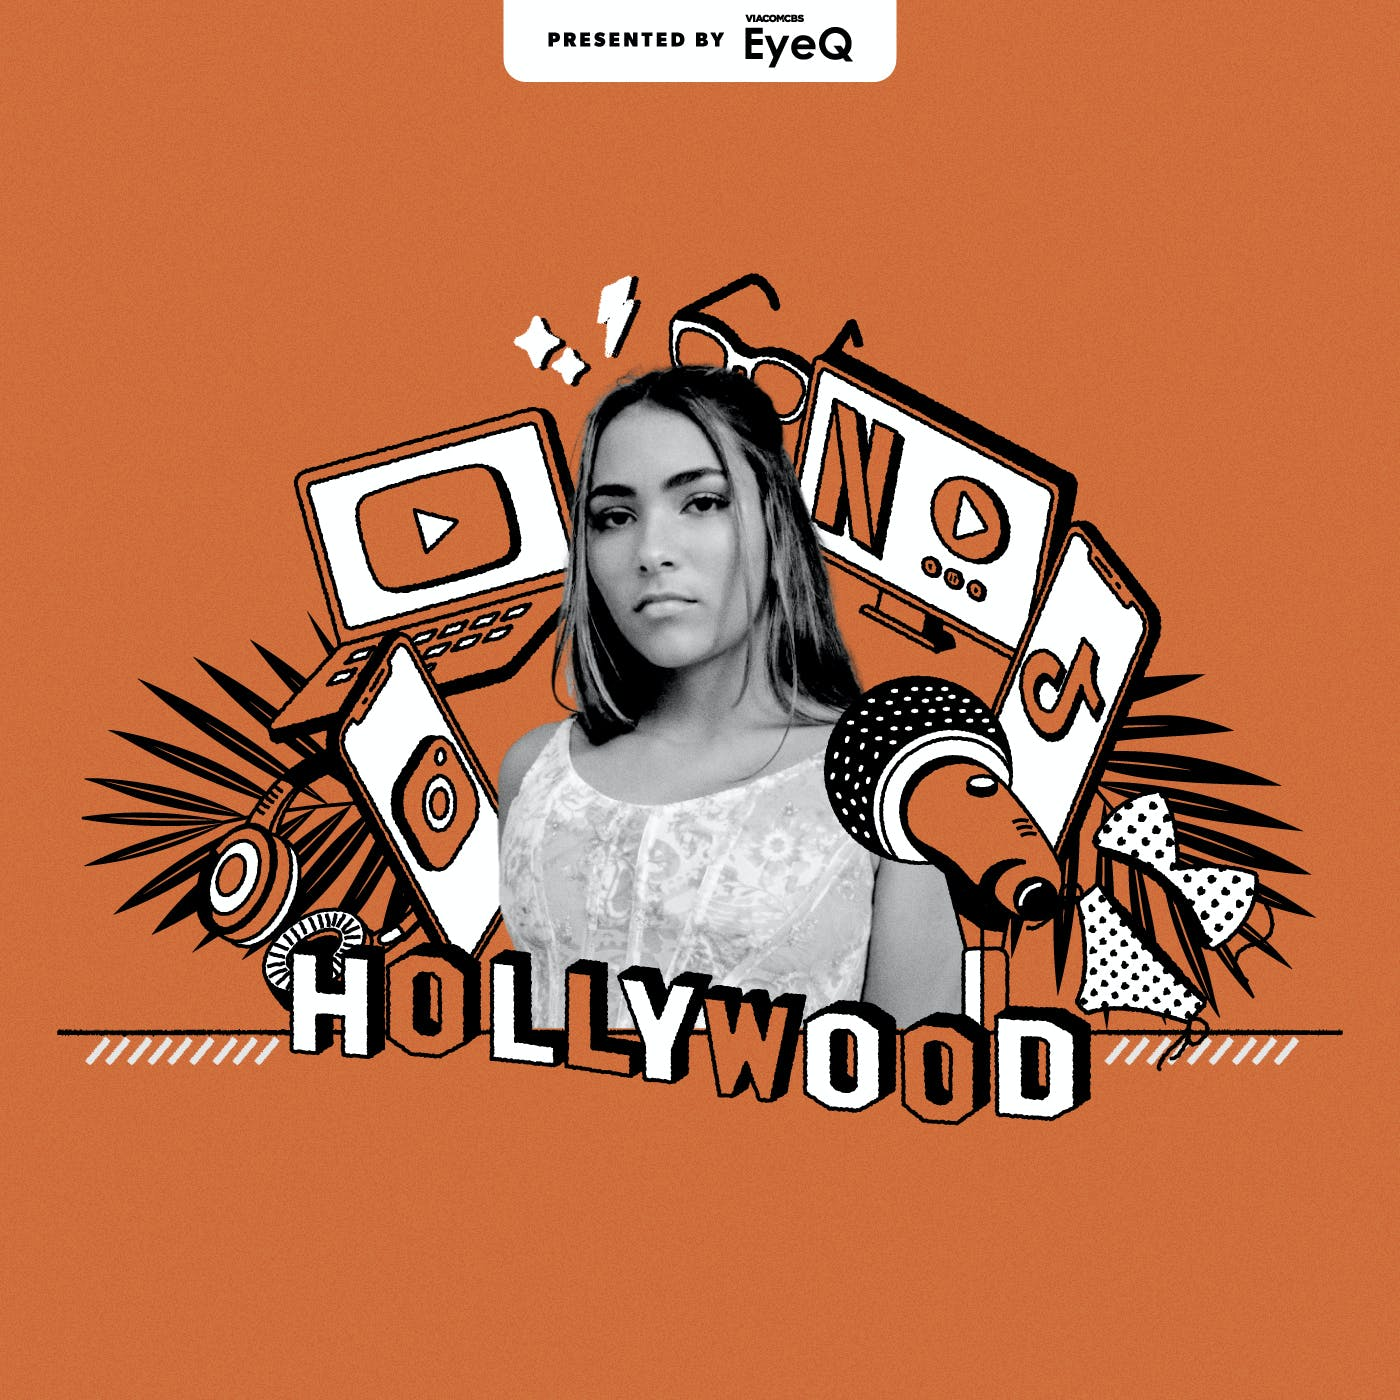 How Sienna Mae Gomez turned into one of TikTok's top stars